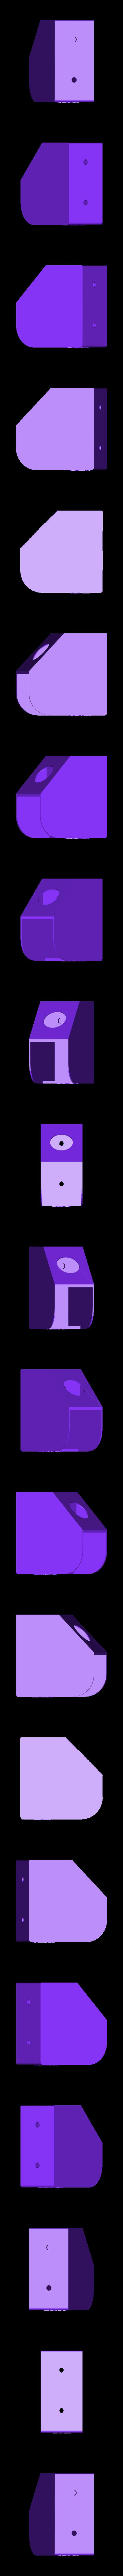 Corner03.STL Download free STL file Mammut - Giant printer. • 3D printable model, tahustvedt